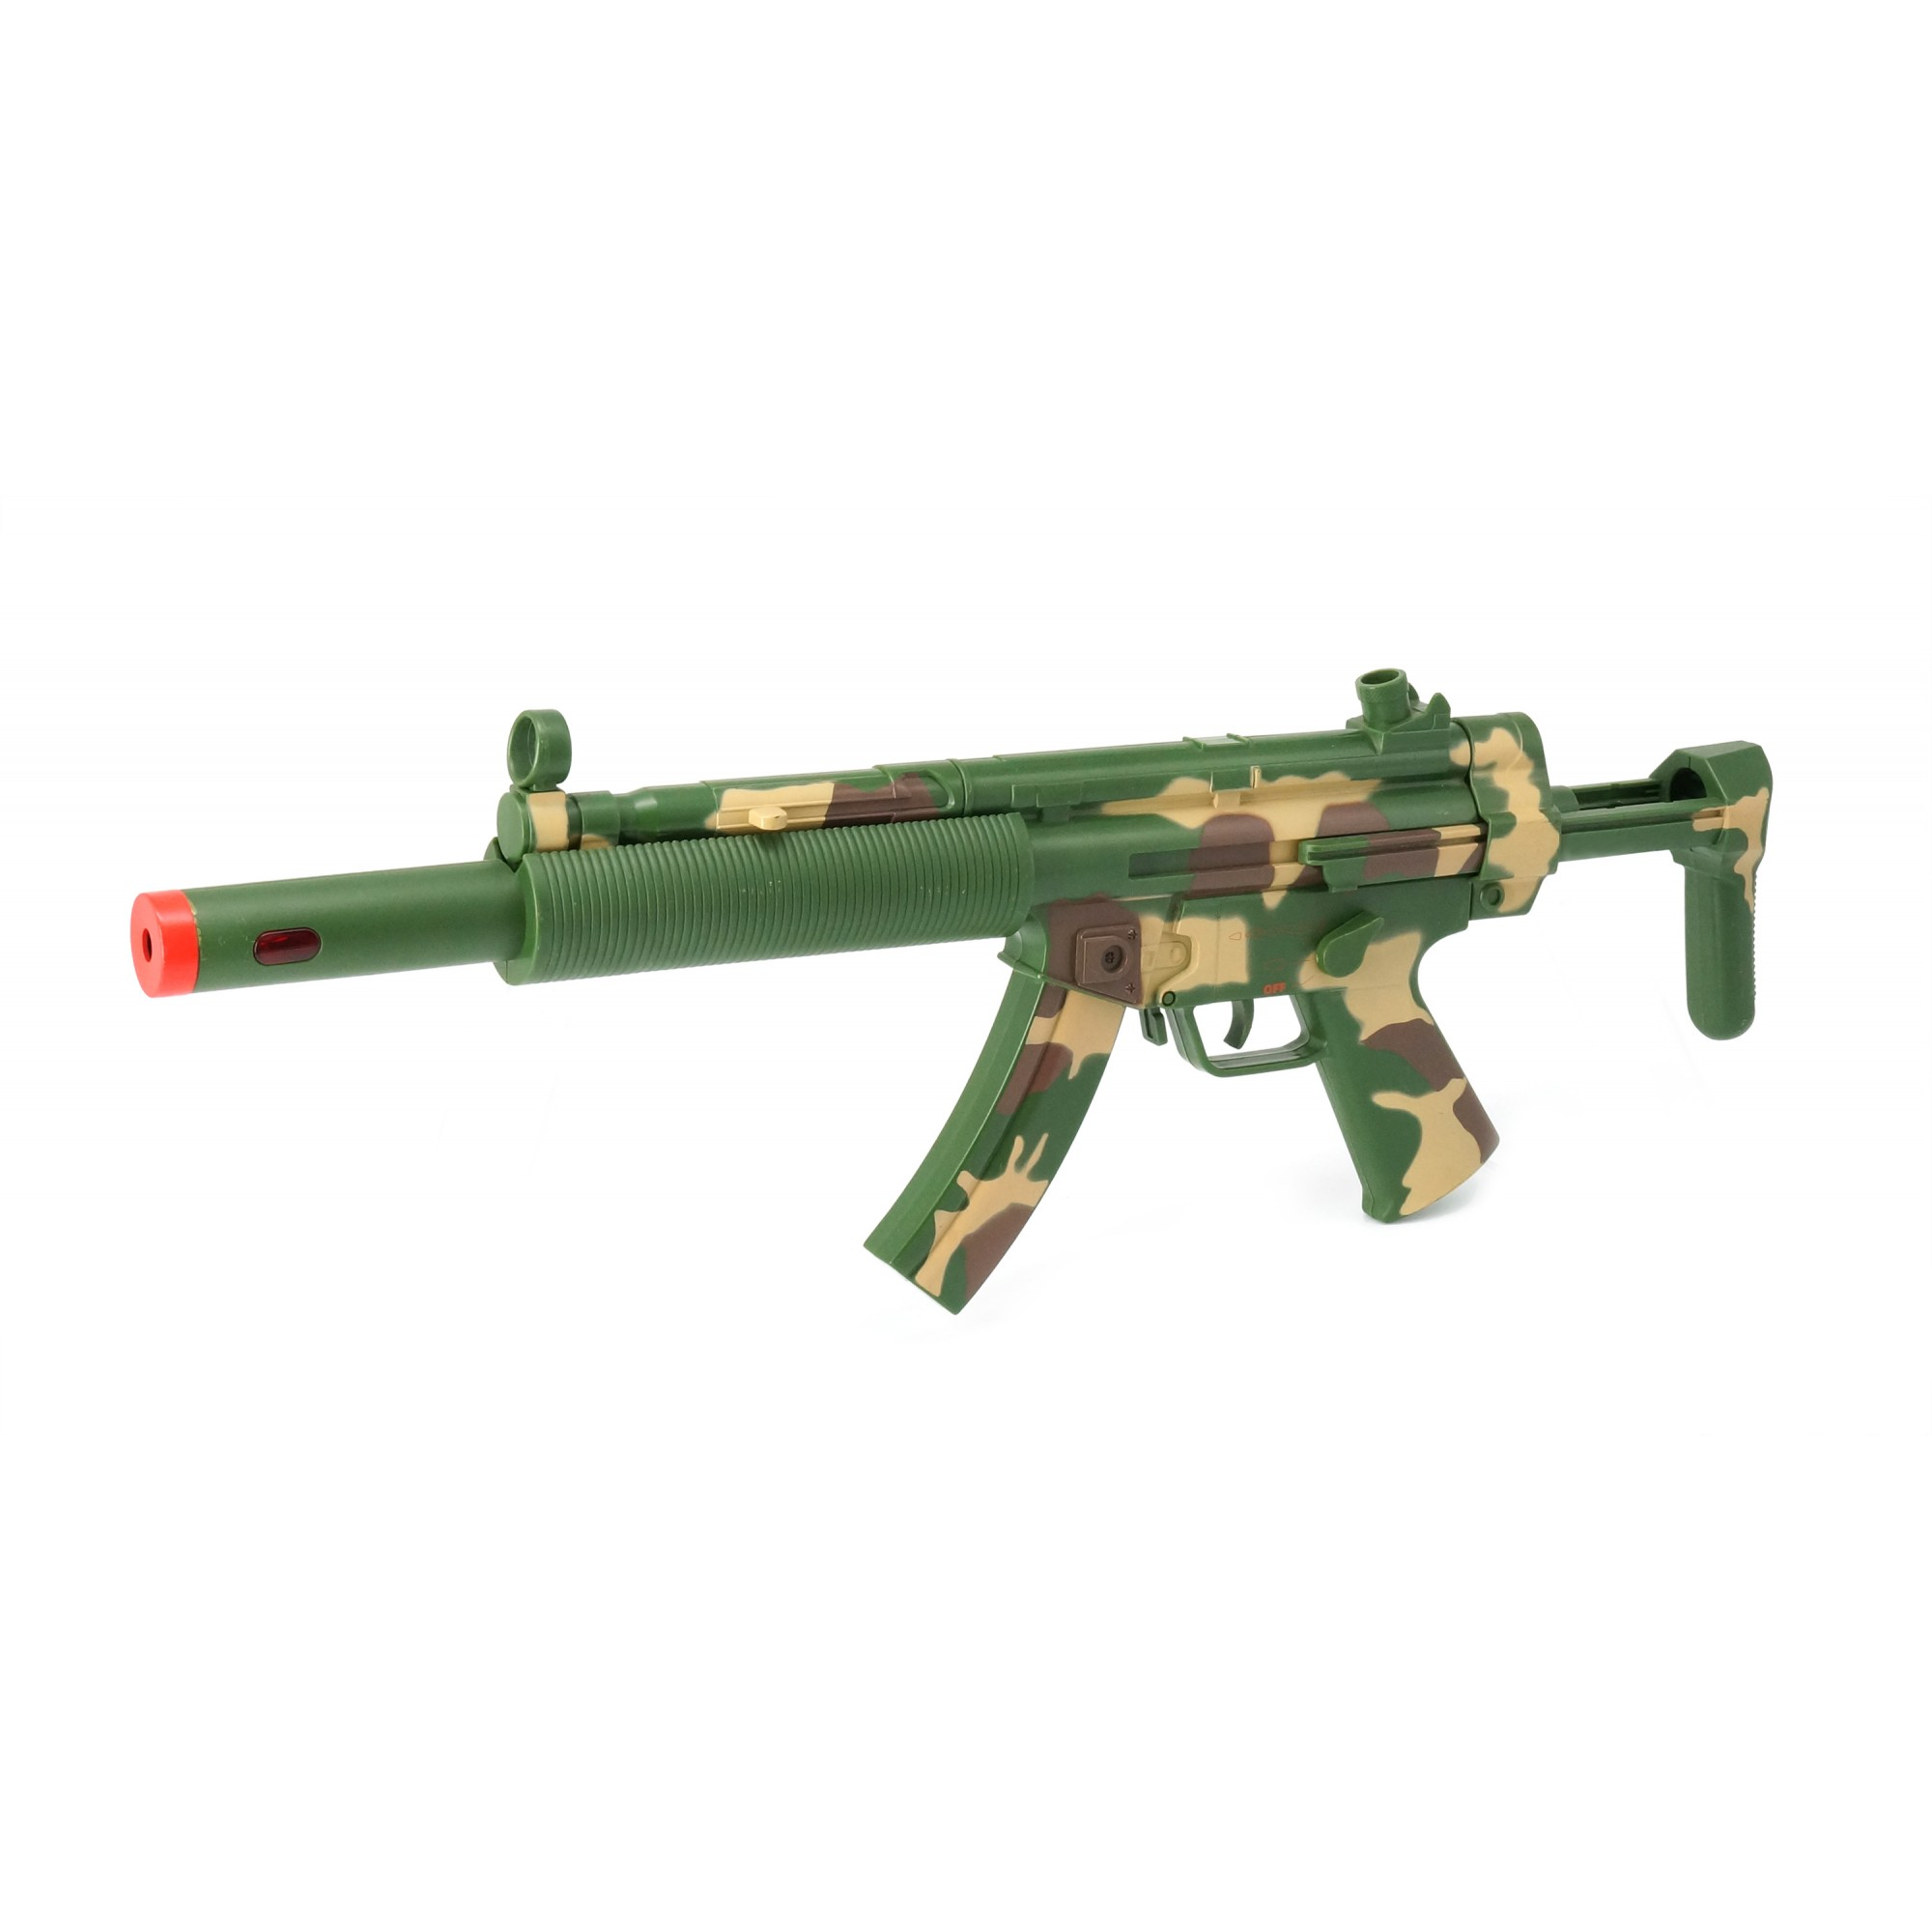 Combat MP5 SD6 W/Light, Sound & Vibration